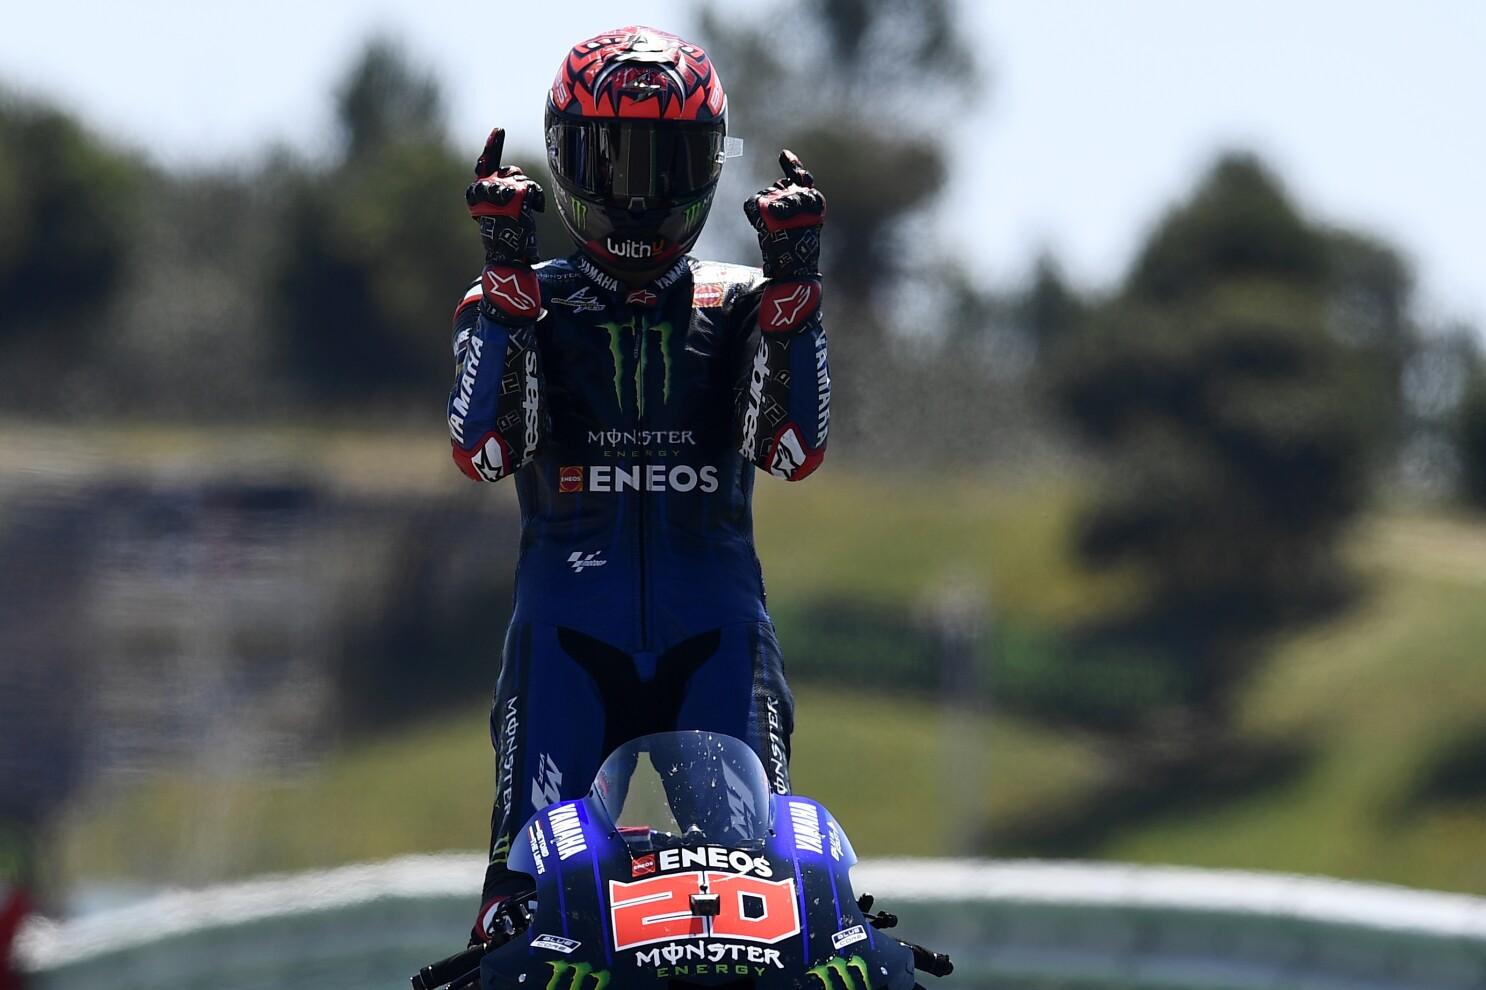 Quartararo wins Portuguese GP; Márquez 7th in 1st race back - The San Diego  Union-Tribune